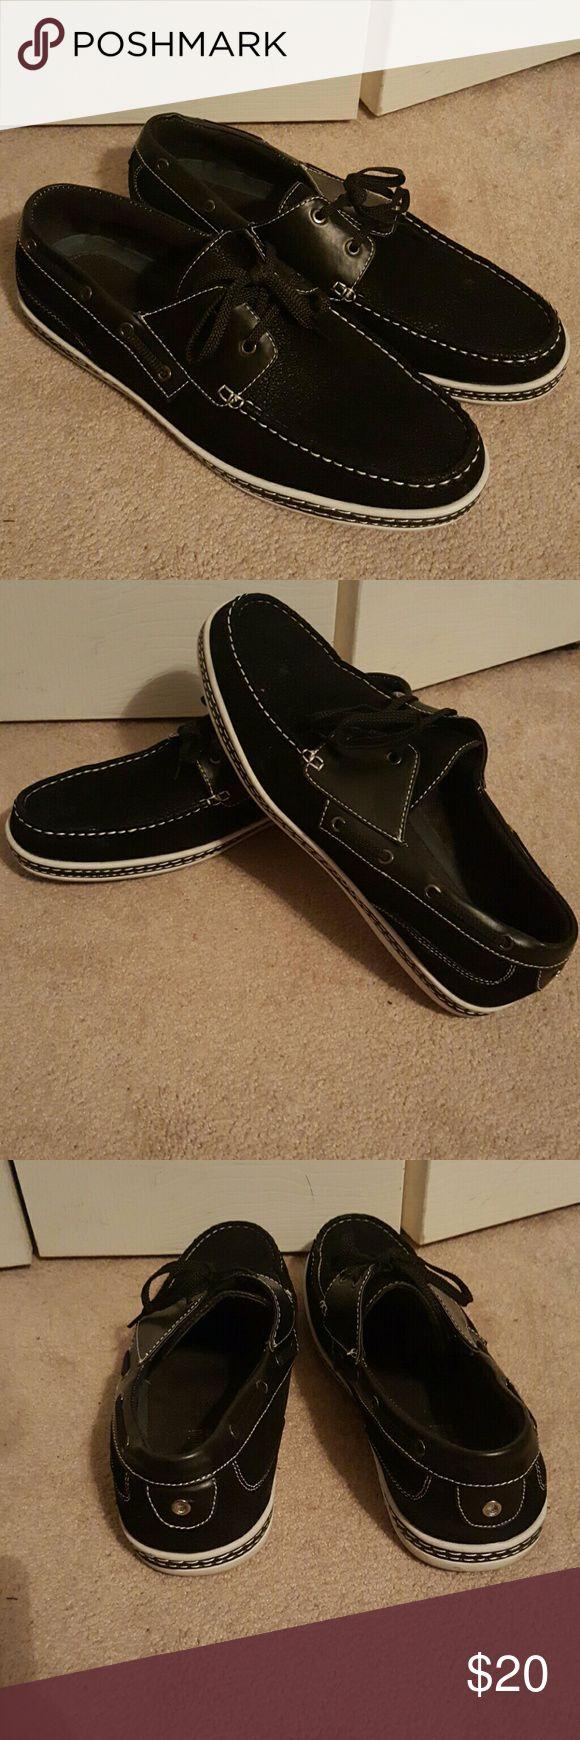 Men's Black Boat Shoes Black Ultra Suede Boat Shoes Shoes Boat Shoes